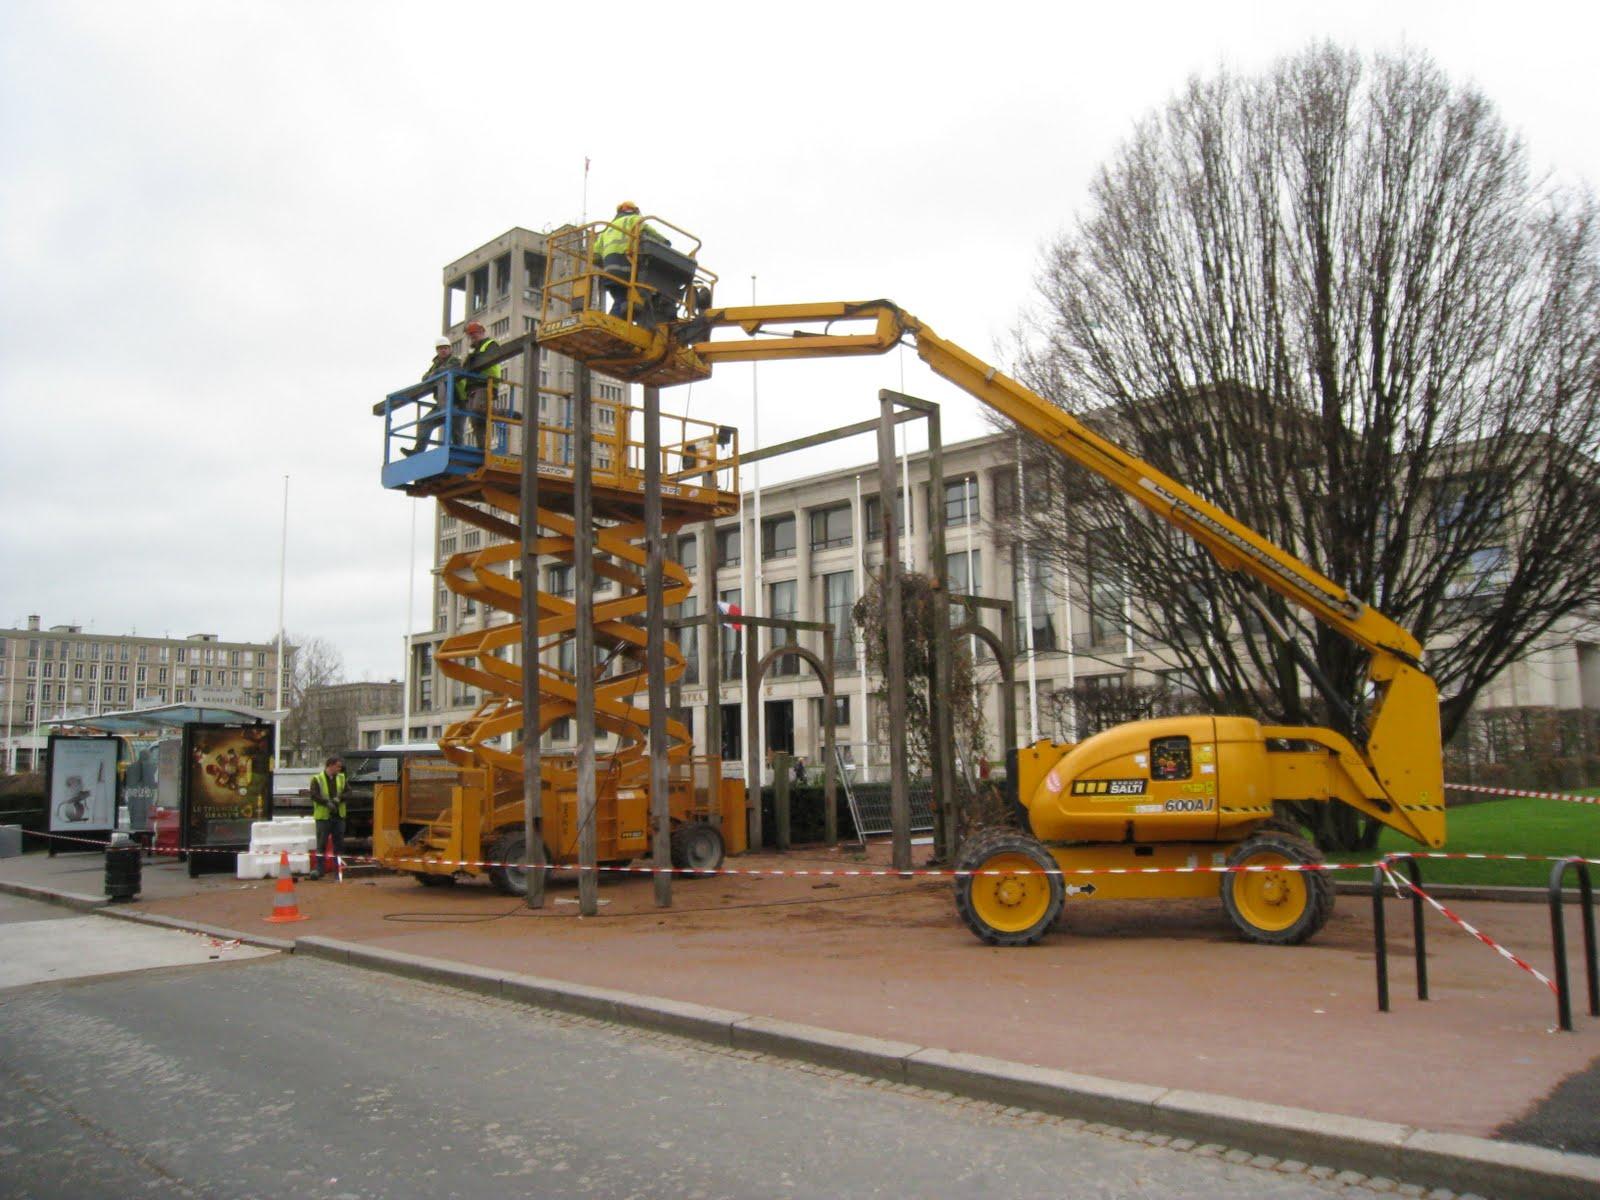 Tramway : En direct du chantier - Page 3 IMG_0895